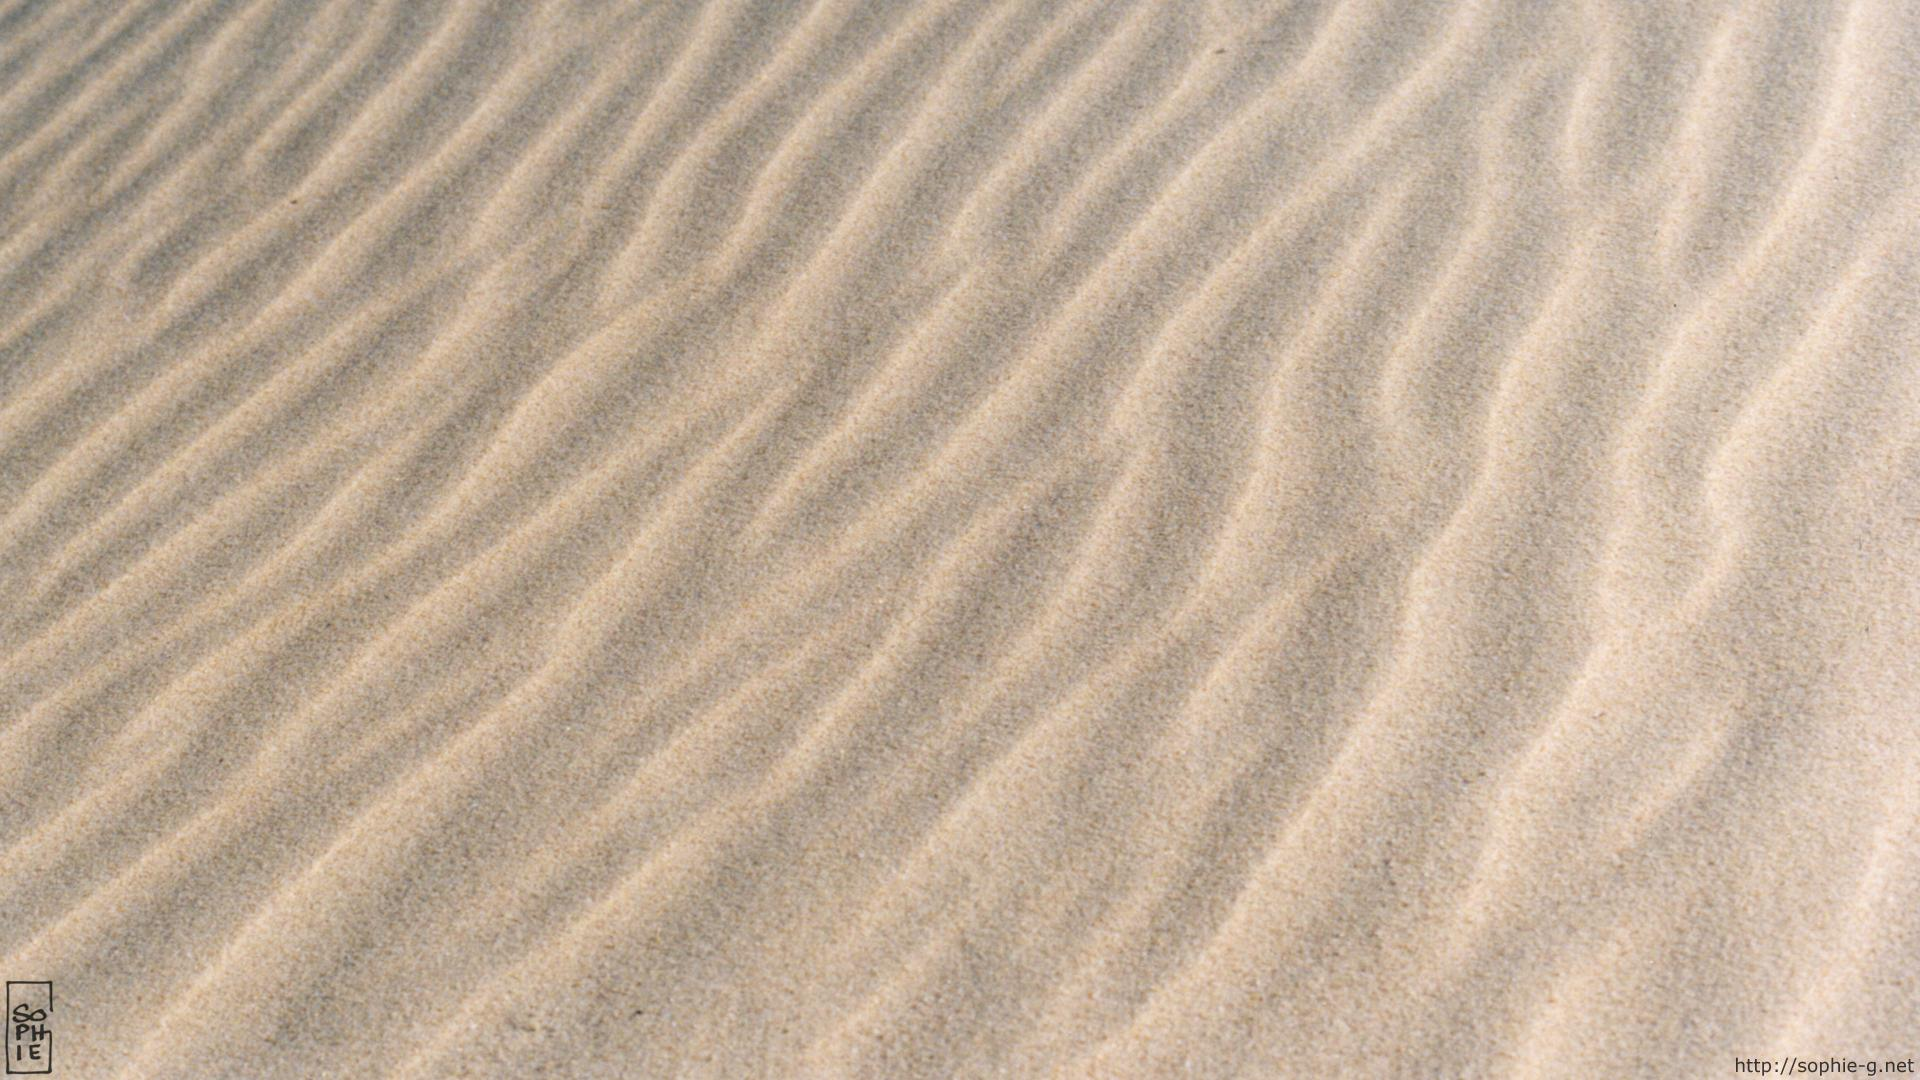 sand ripples 1920 1080 desktop wallpaper ridules de sable fond d cran 1920 1080 sophie s. Black Bedroom Furniture Sets. Home Design Ideas